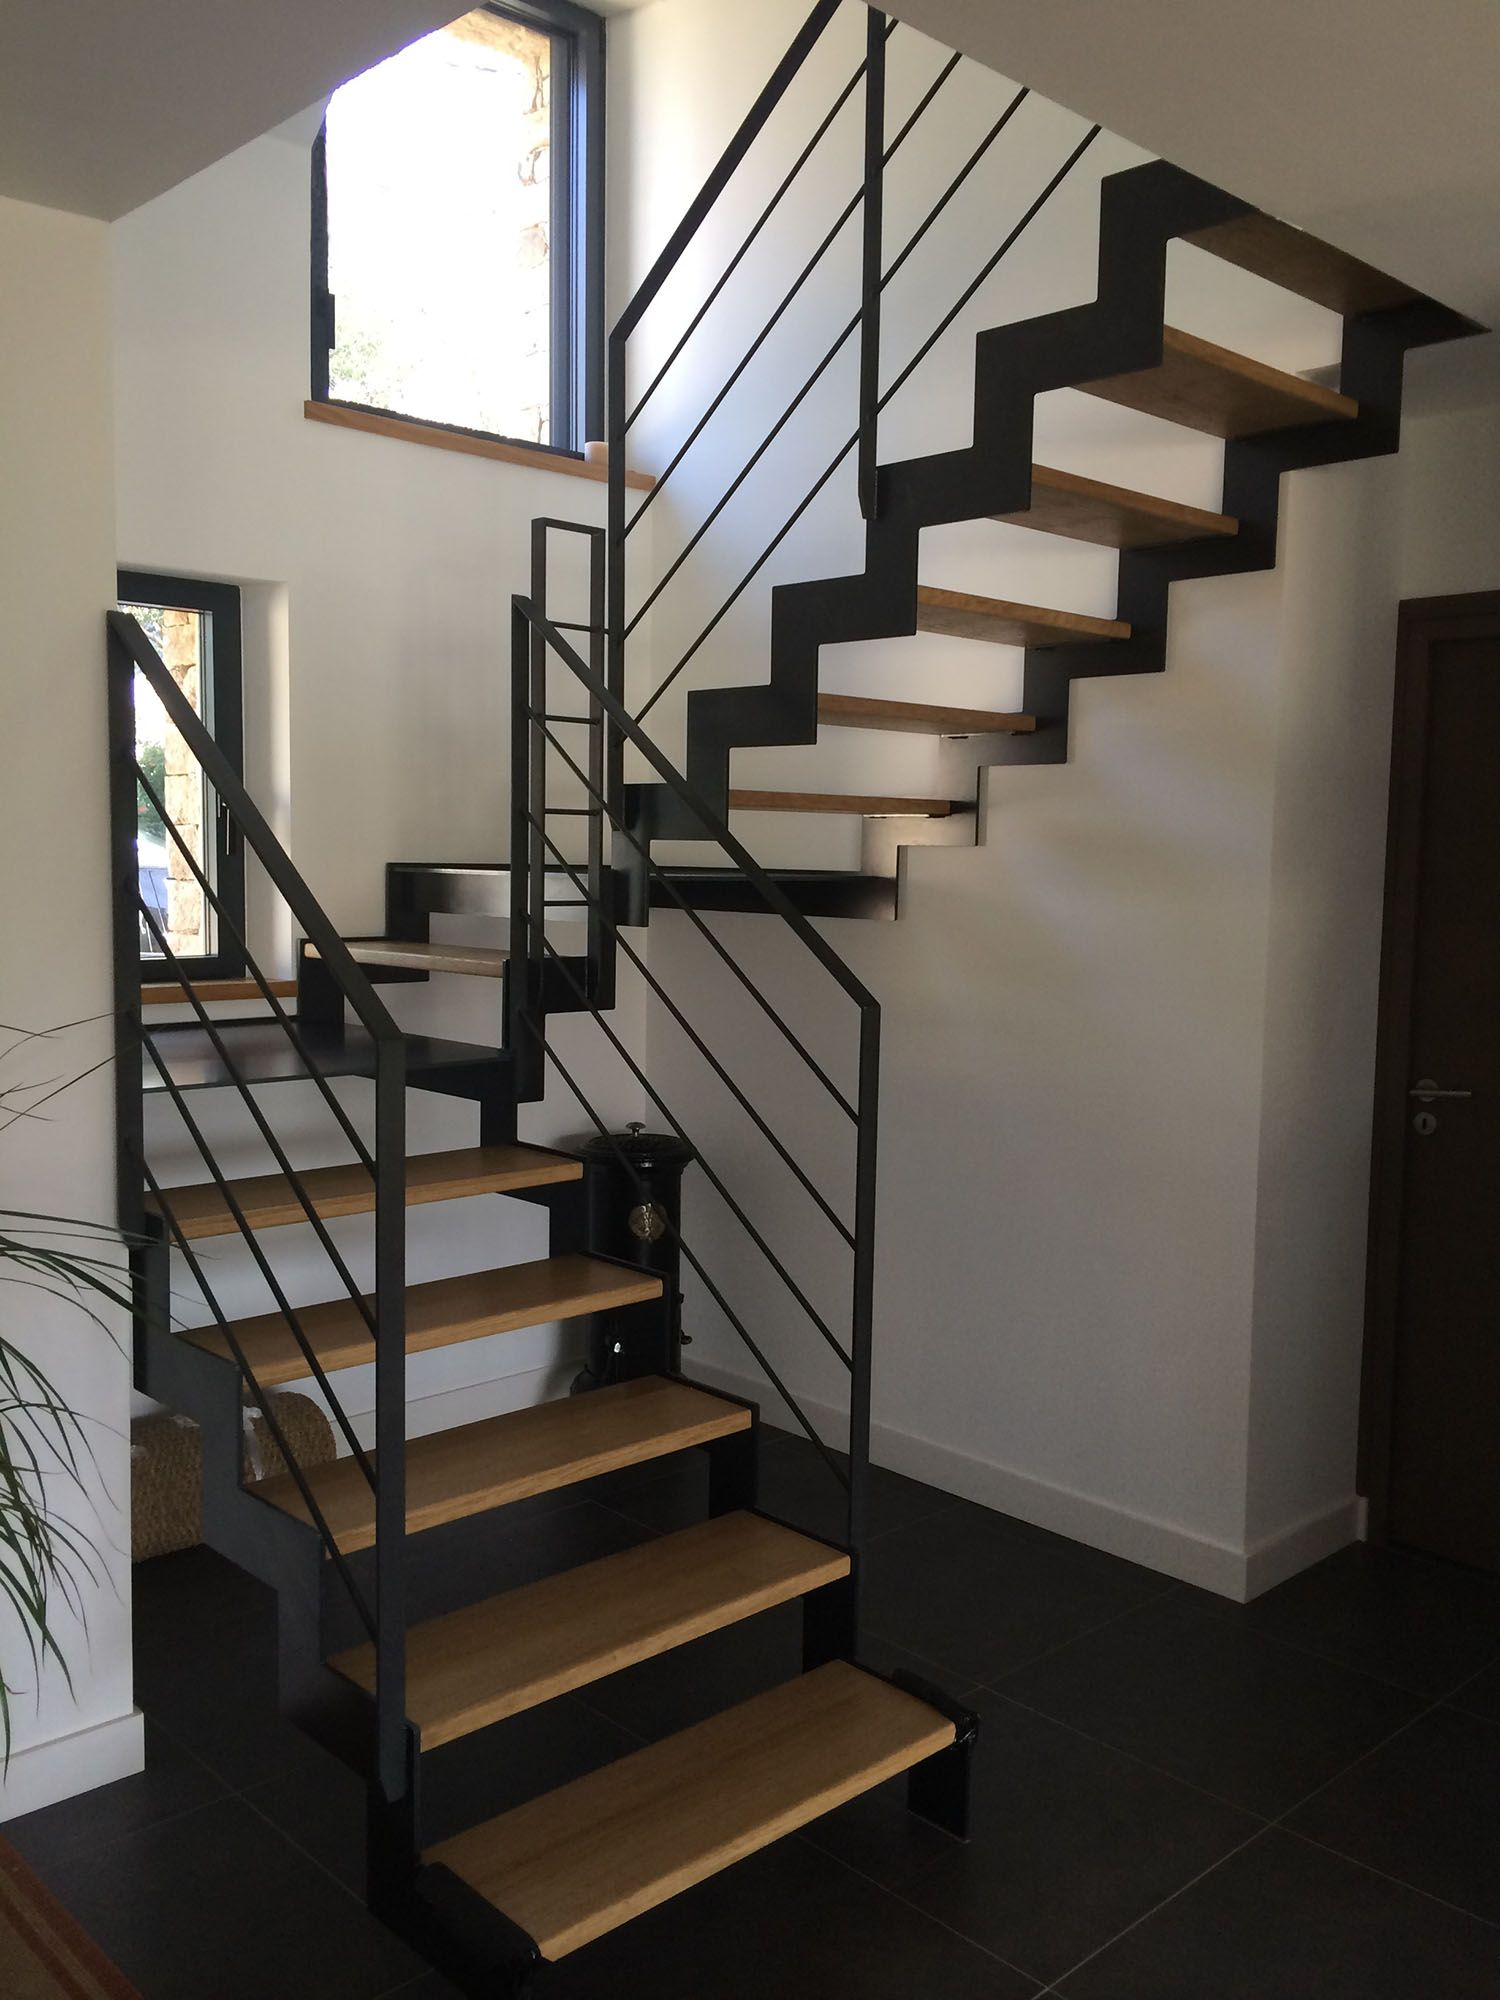 Escalier Metal Bois Escaliers Pinterest Staircases Black